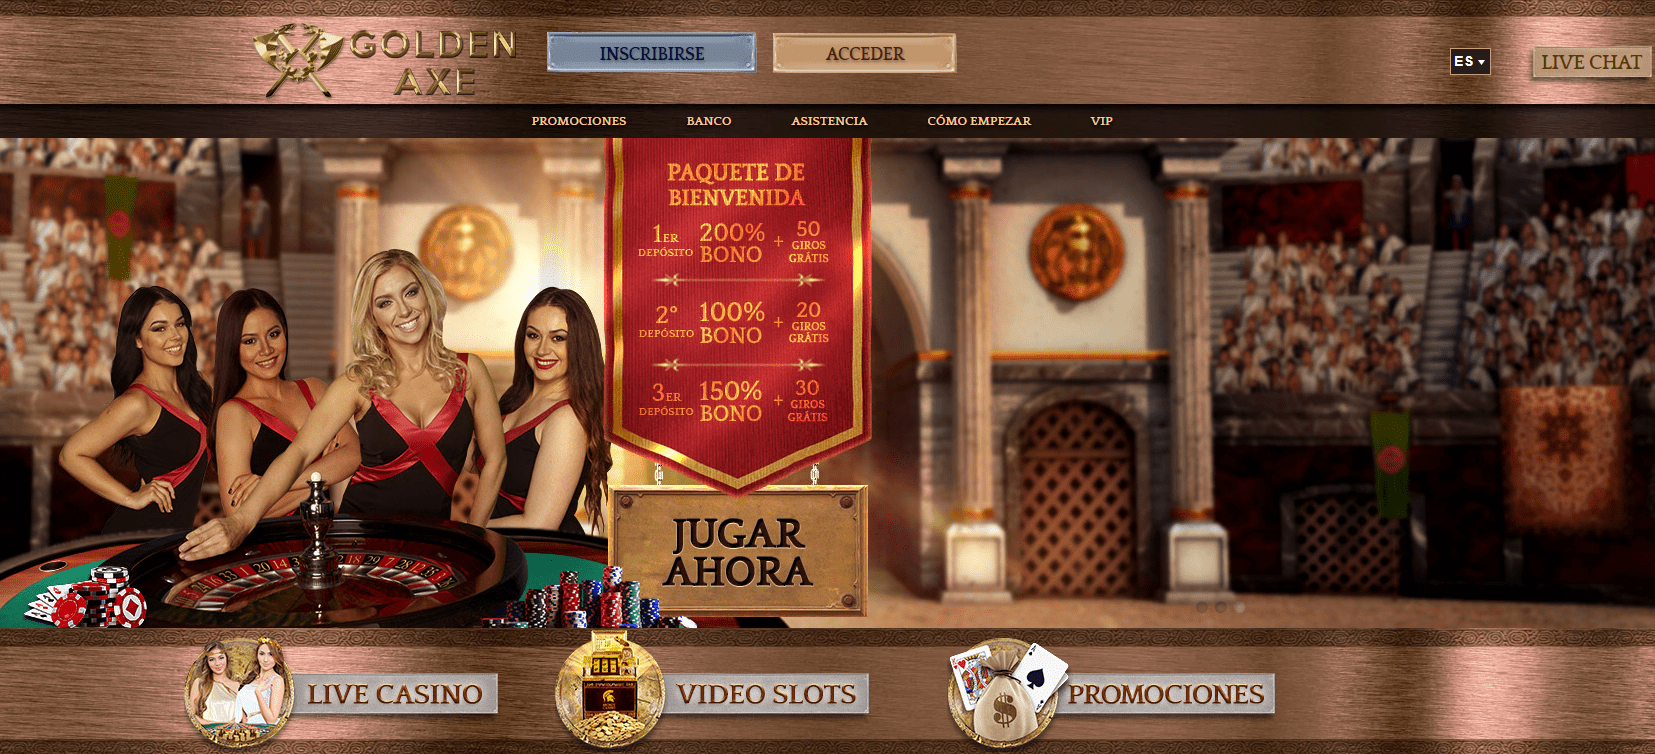 golden axe casino promociones